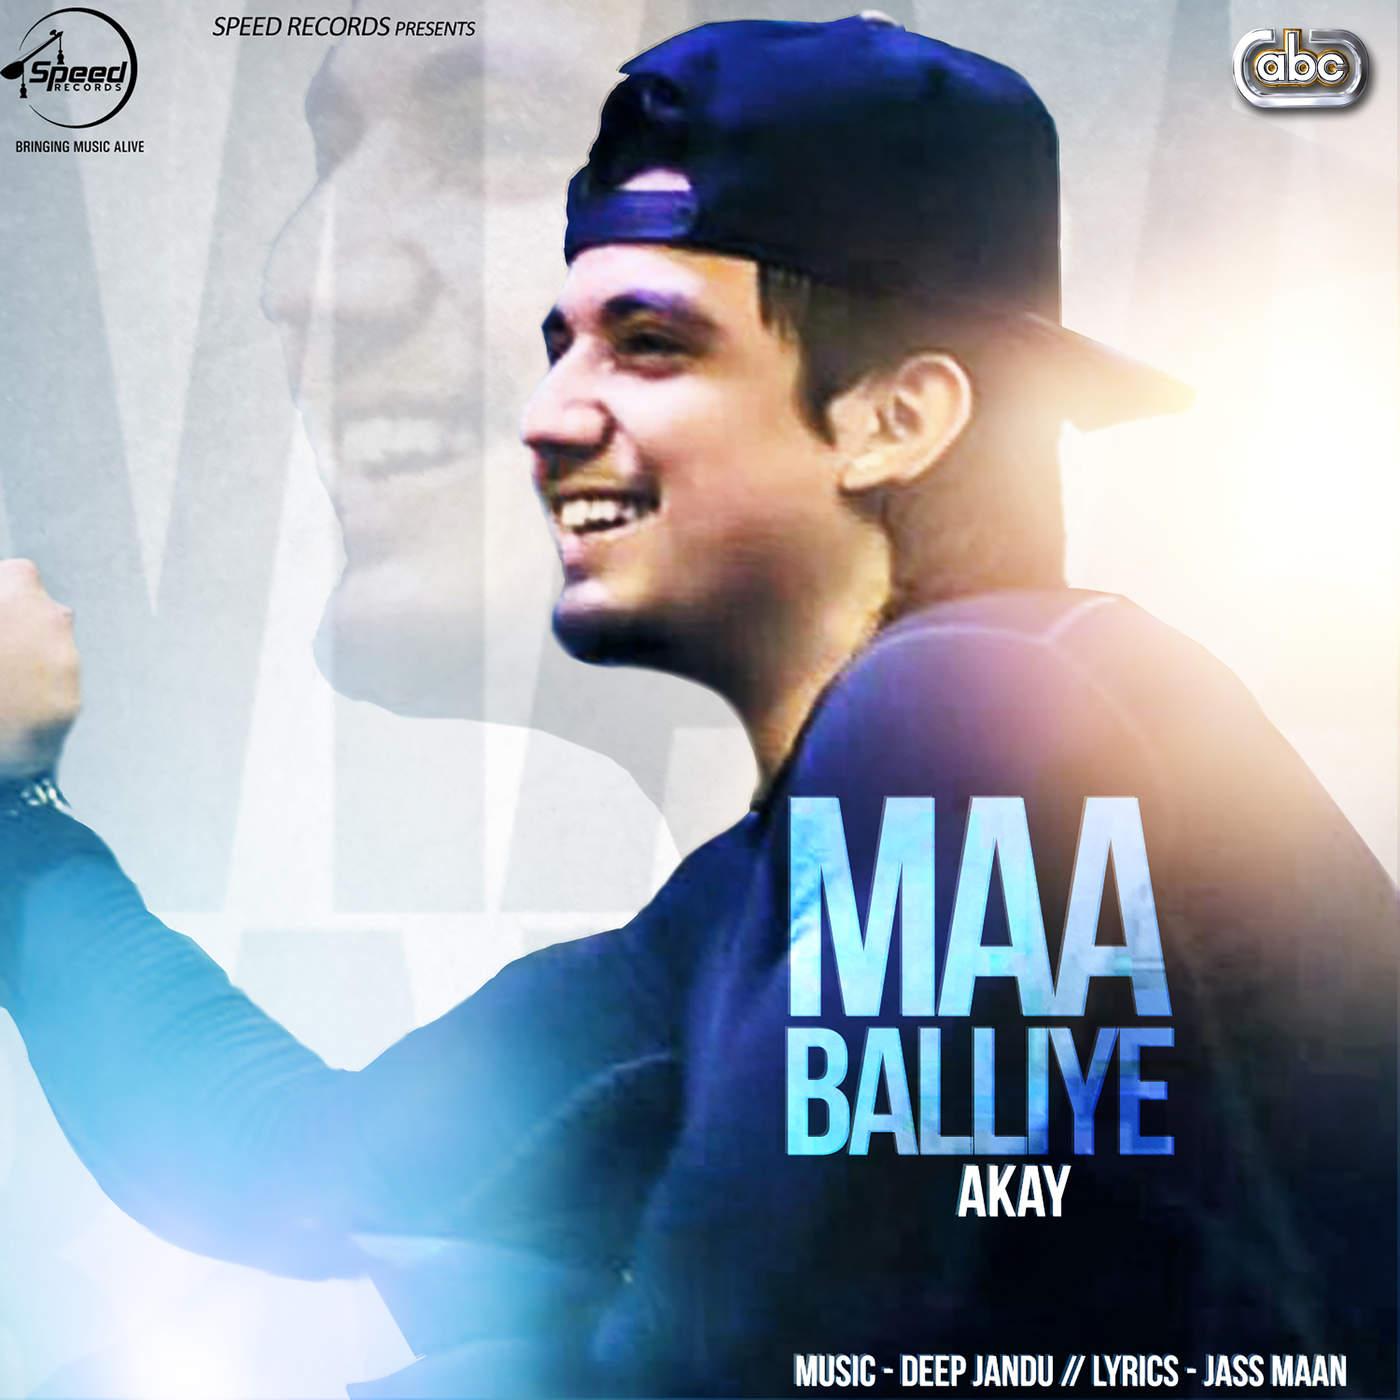 A-Kay - Maa Balliye (with Deep Jandu) - Single